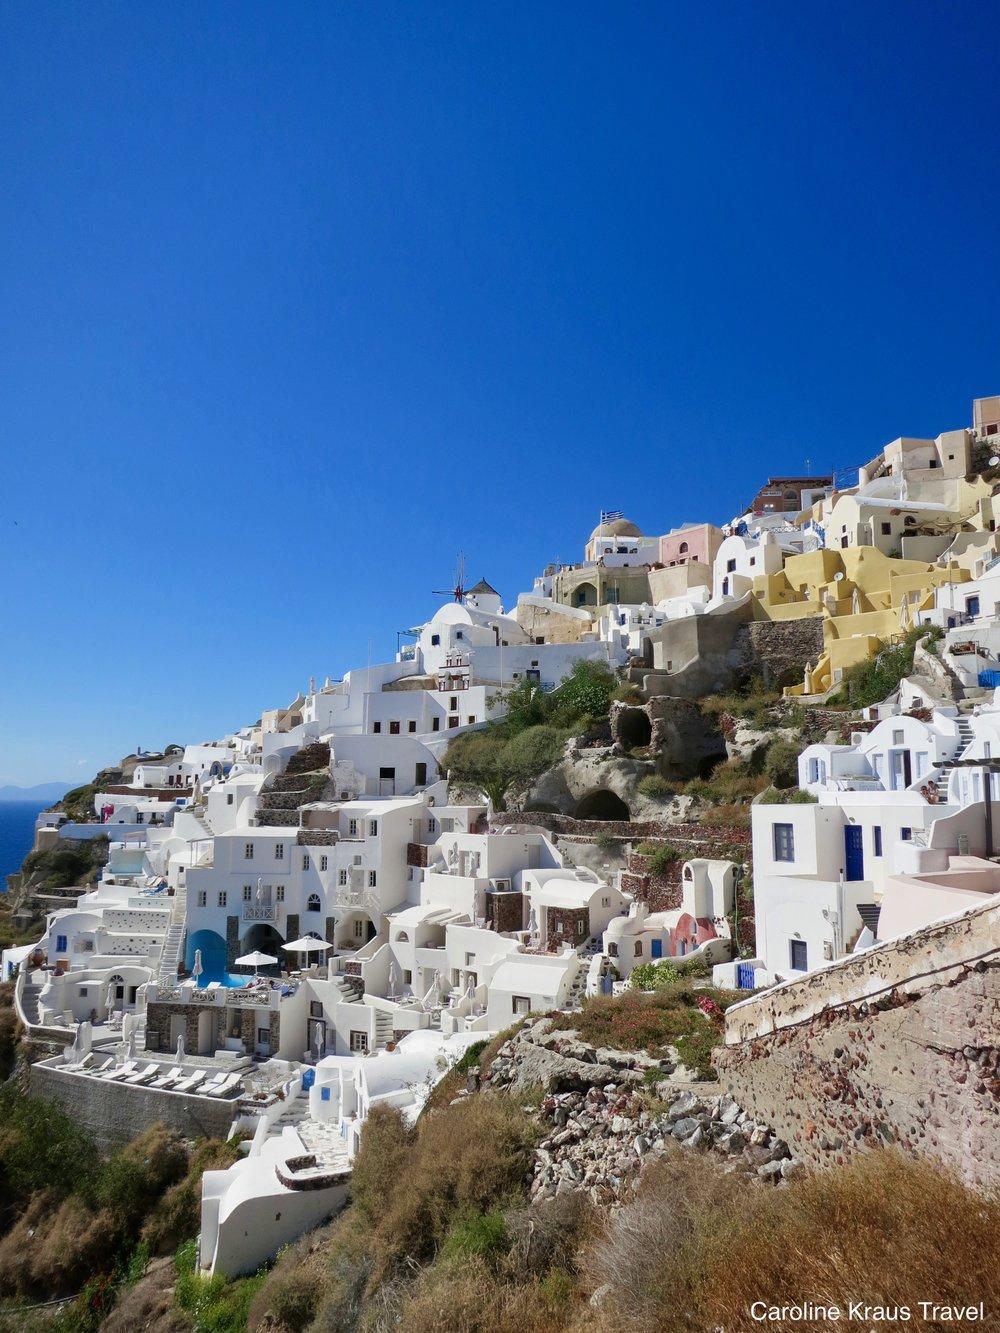 Town of Oia, Santorini, Greece